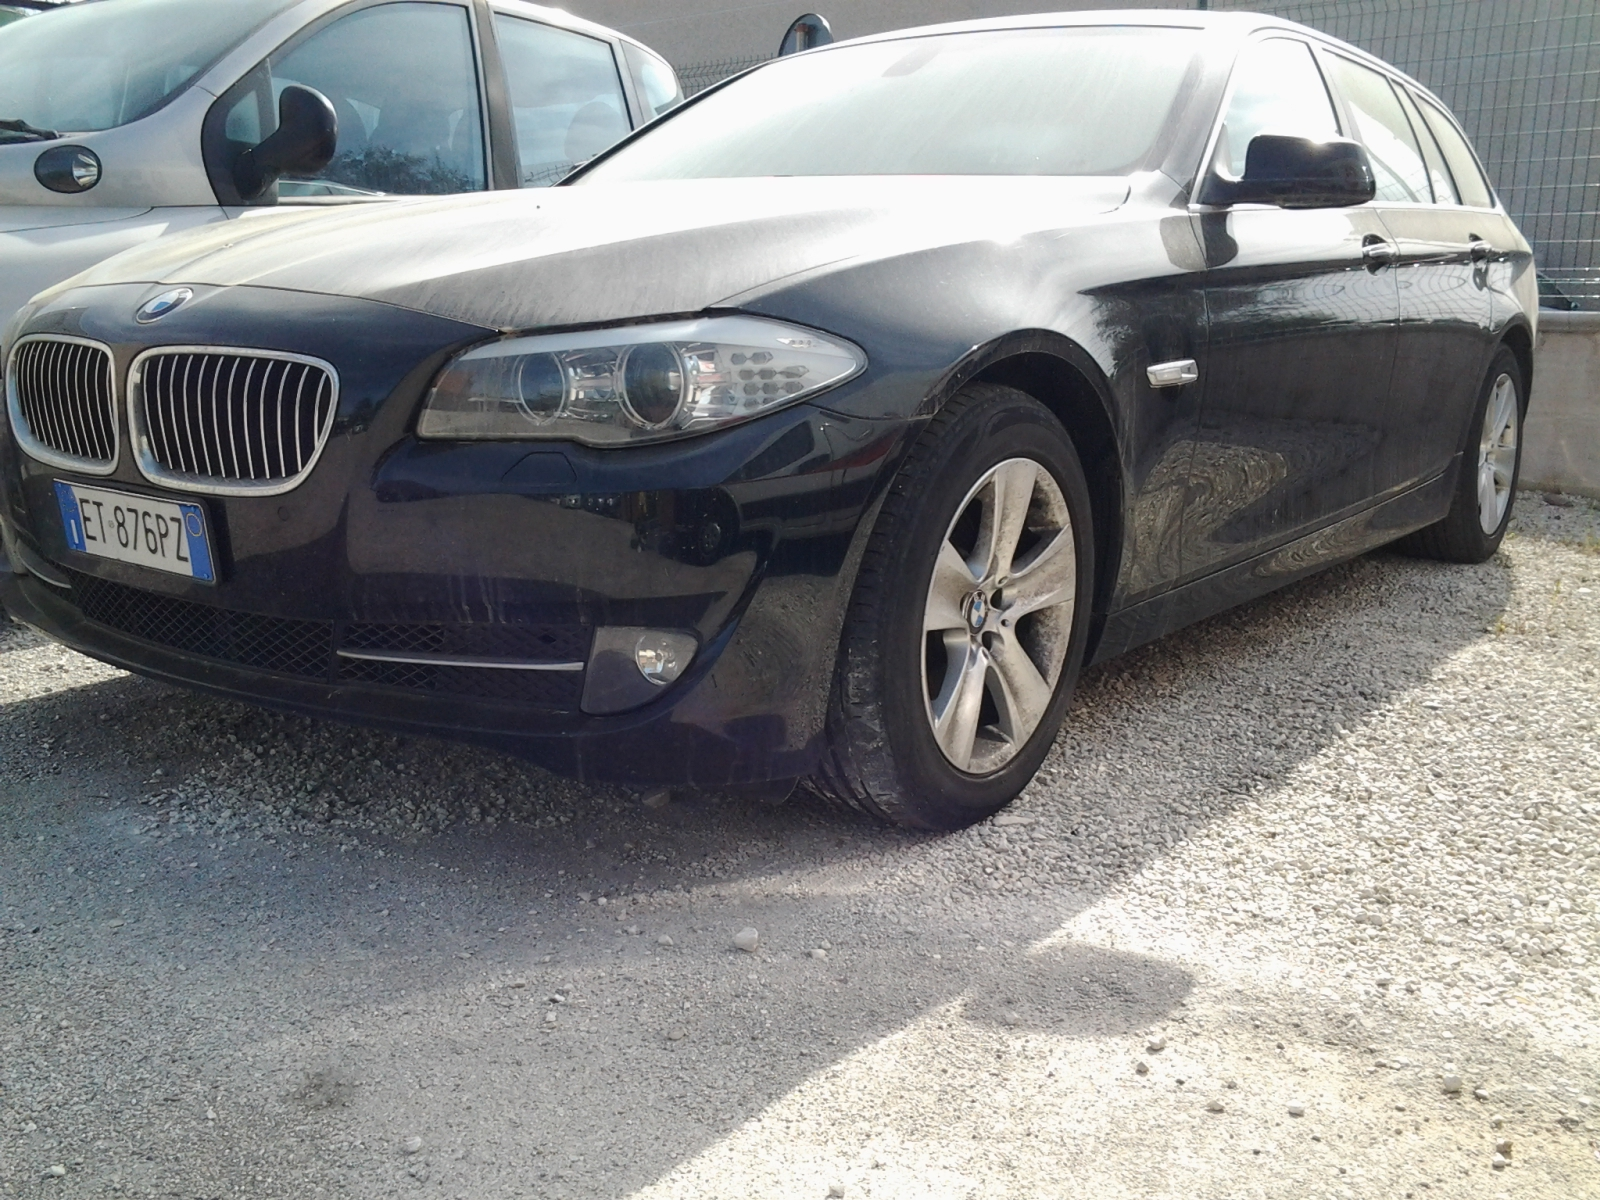 AUTOVETTURA BMW 520D TG. ET876PZ